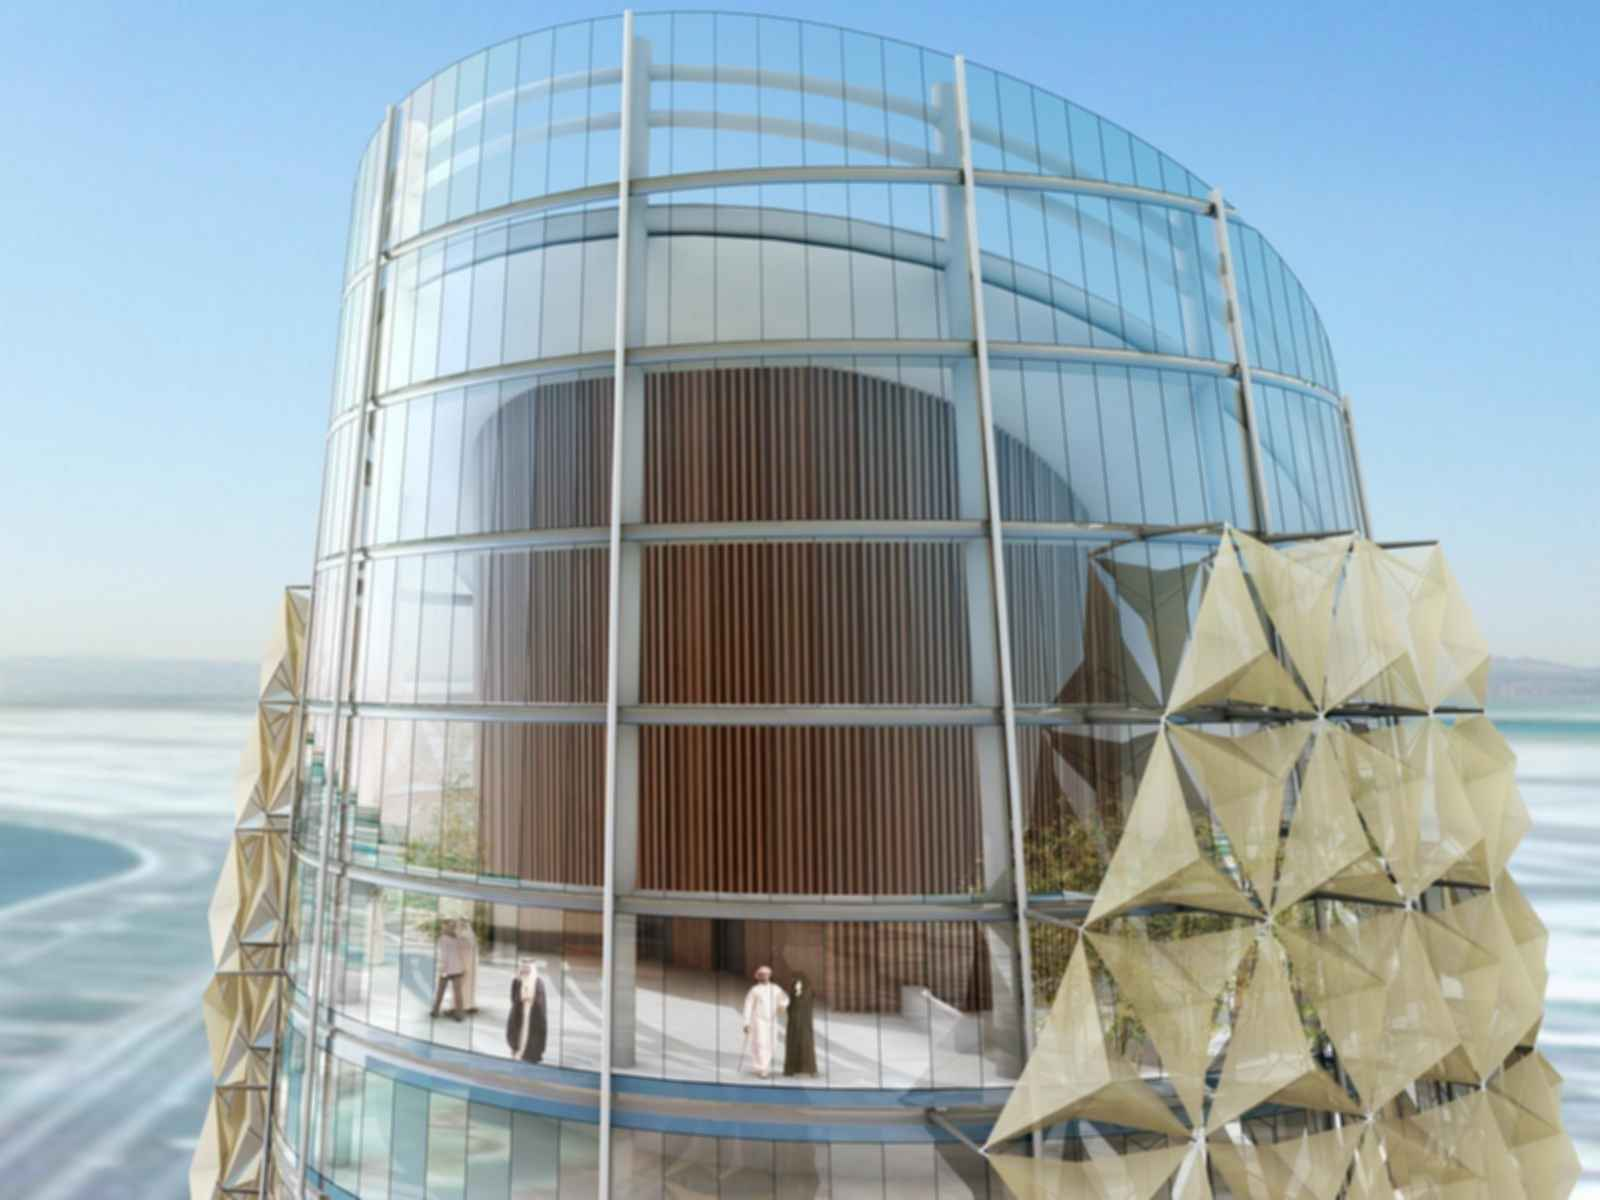 Al Bahar Towers - Concept Design